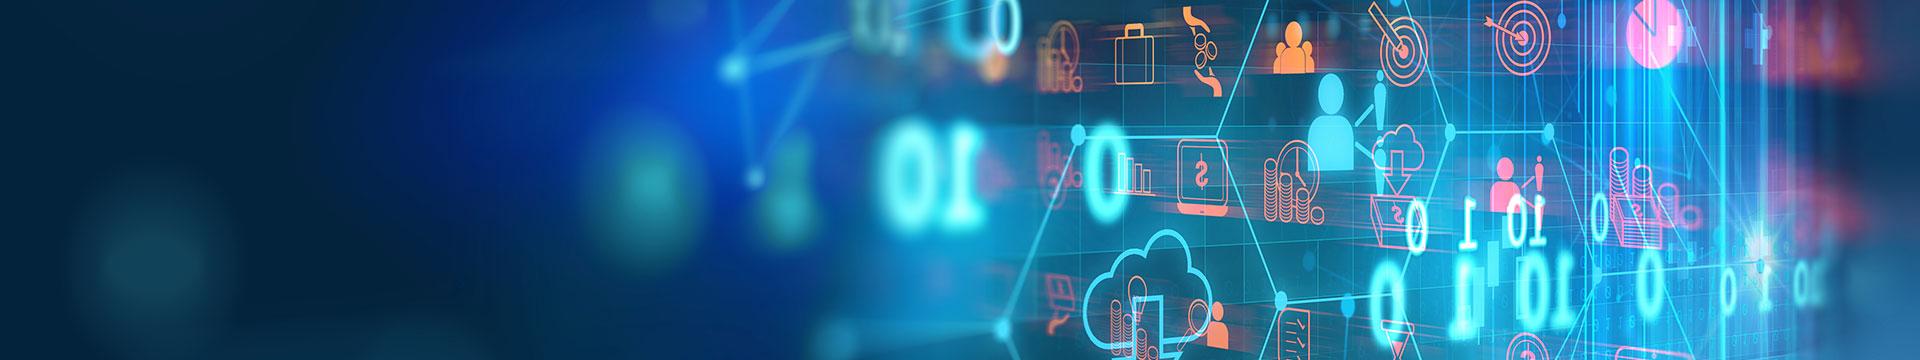 Technology, Media and Telecoms Regulatory